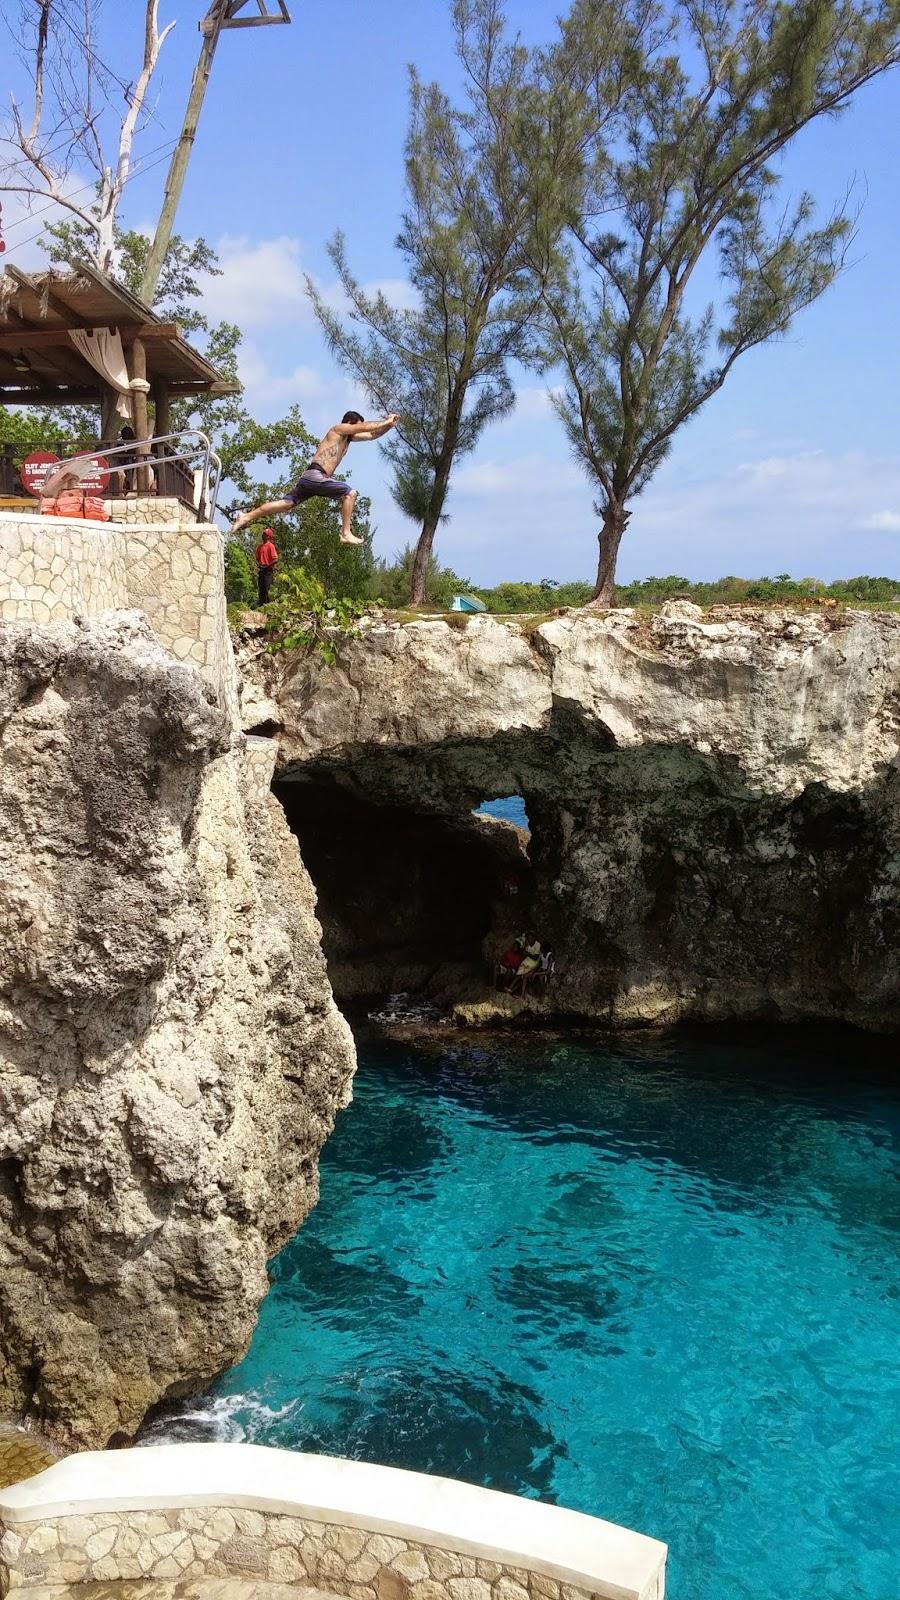 Jamaica, Negril, blue